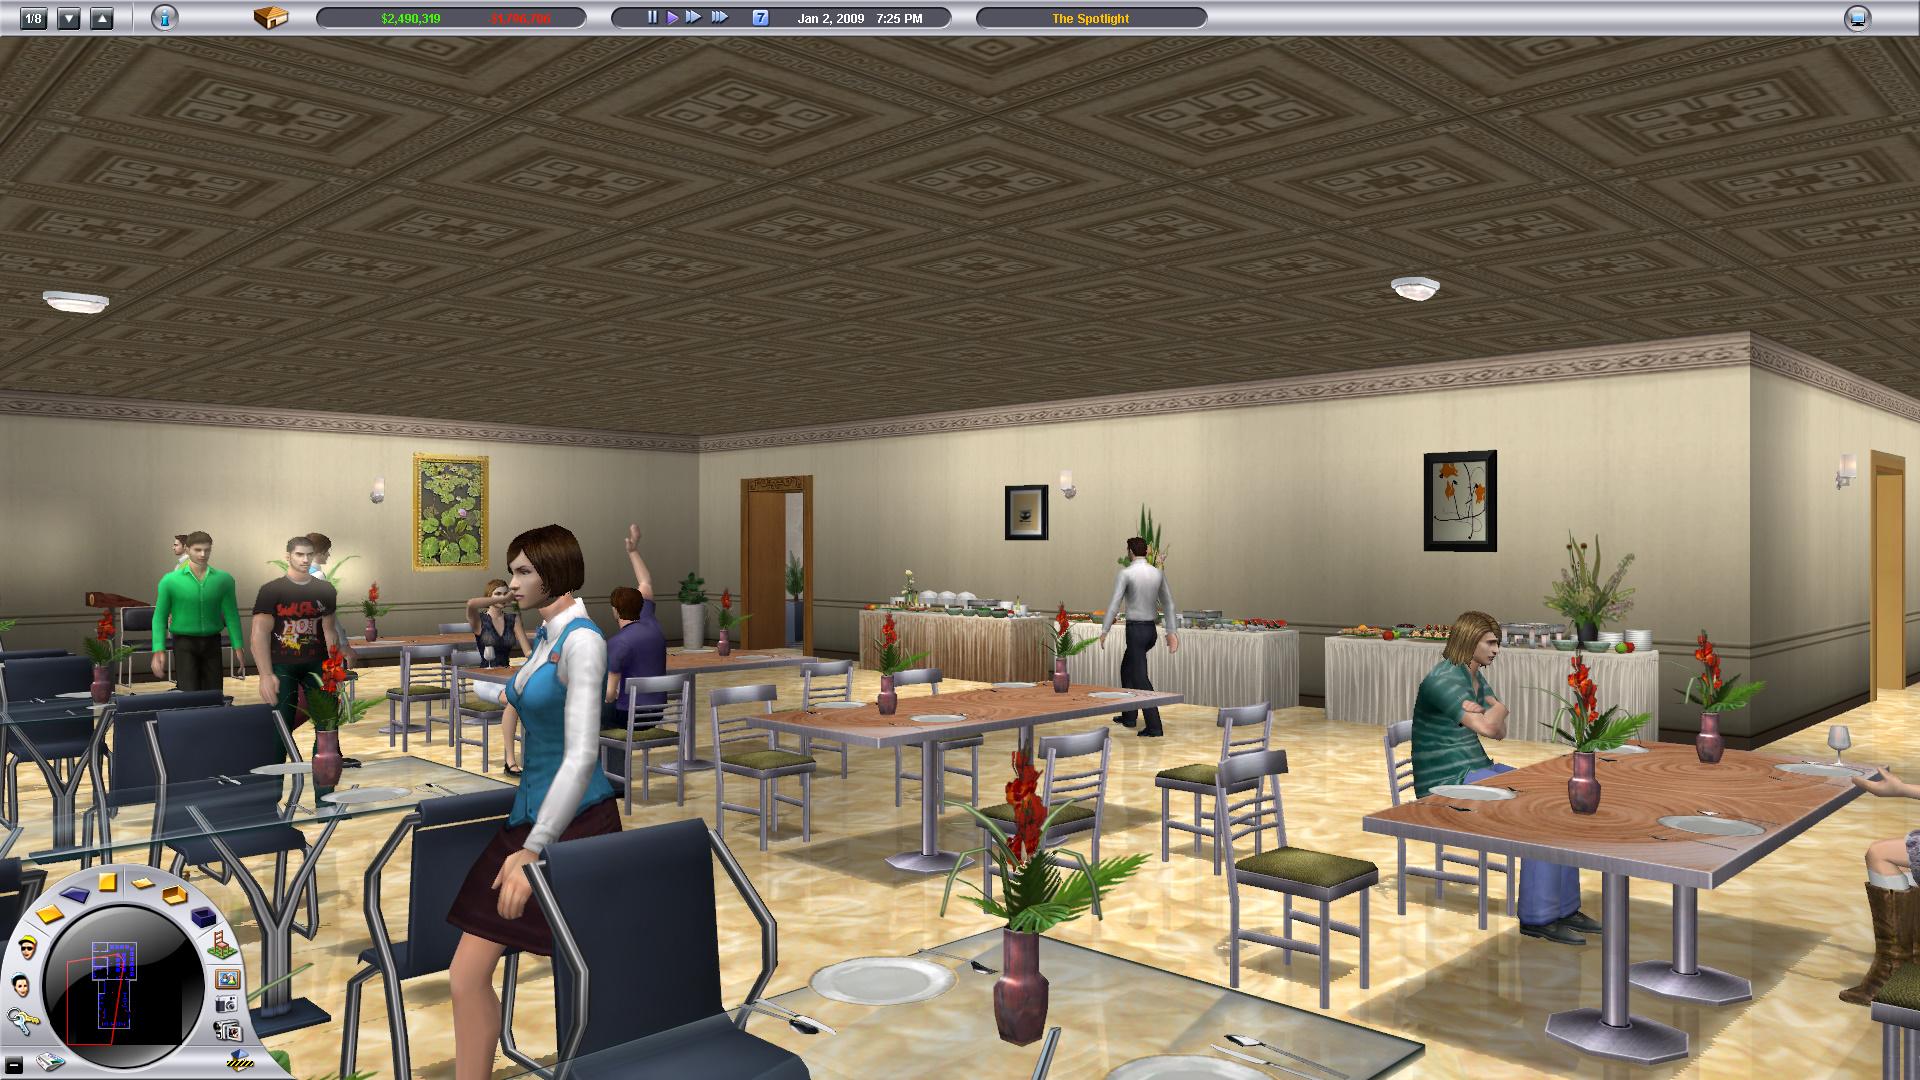 Hotel Giant 2 Screenshot 2